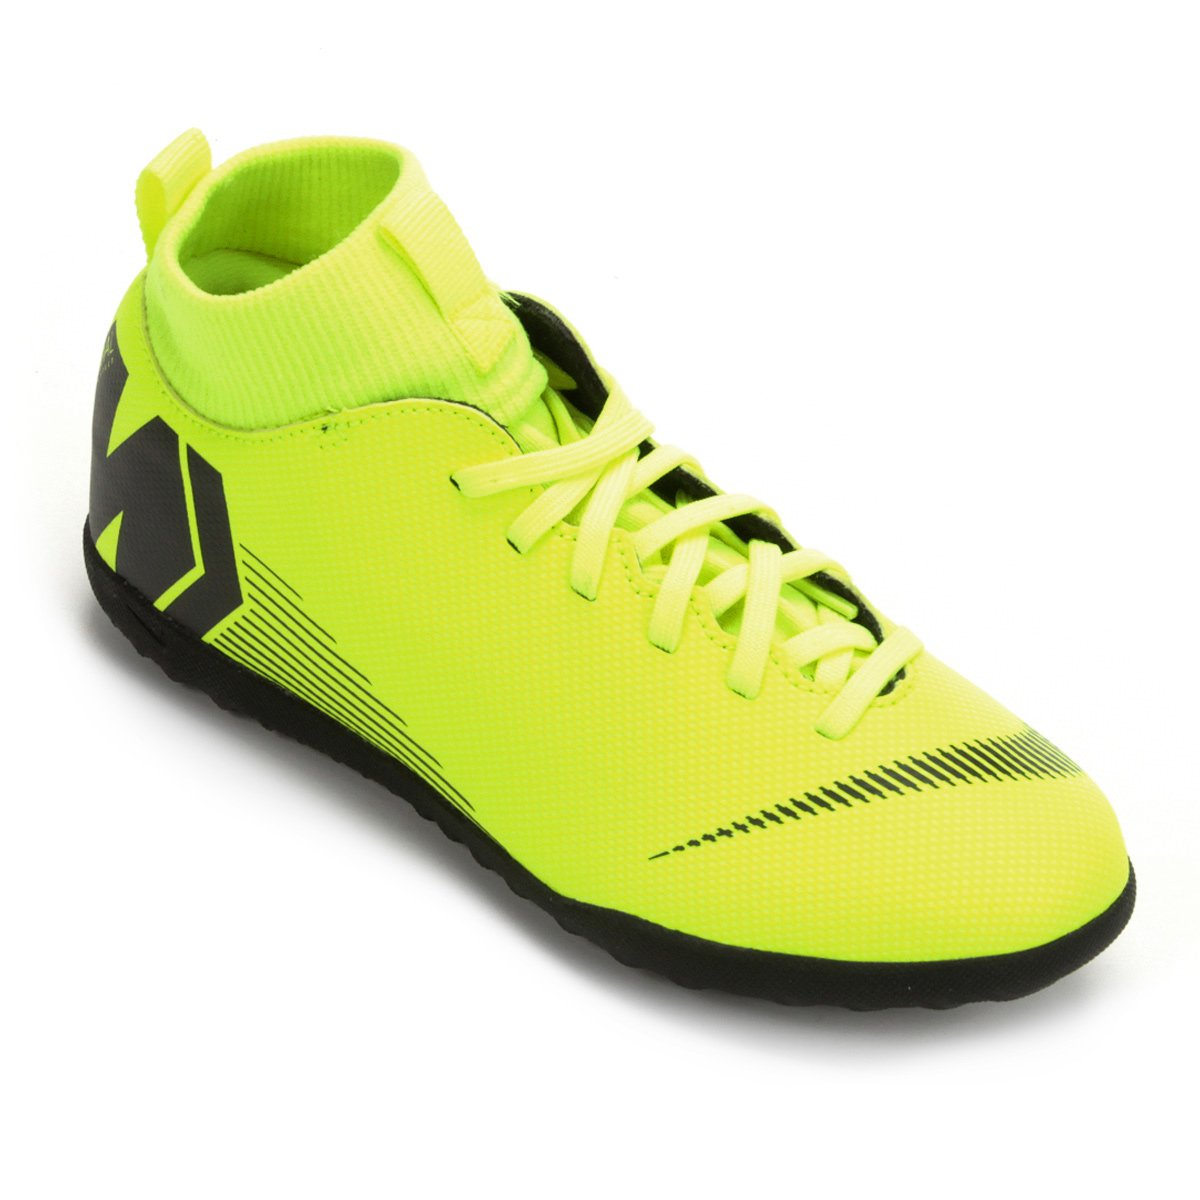 8eb7695253 Chuteira Society Infantil Nike Mercurial Superfly 6 Club - Compre ...